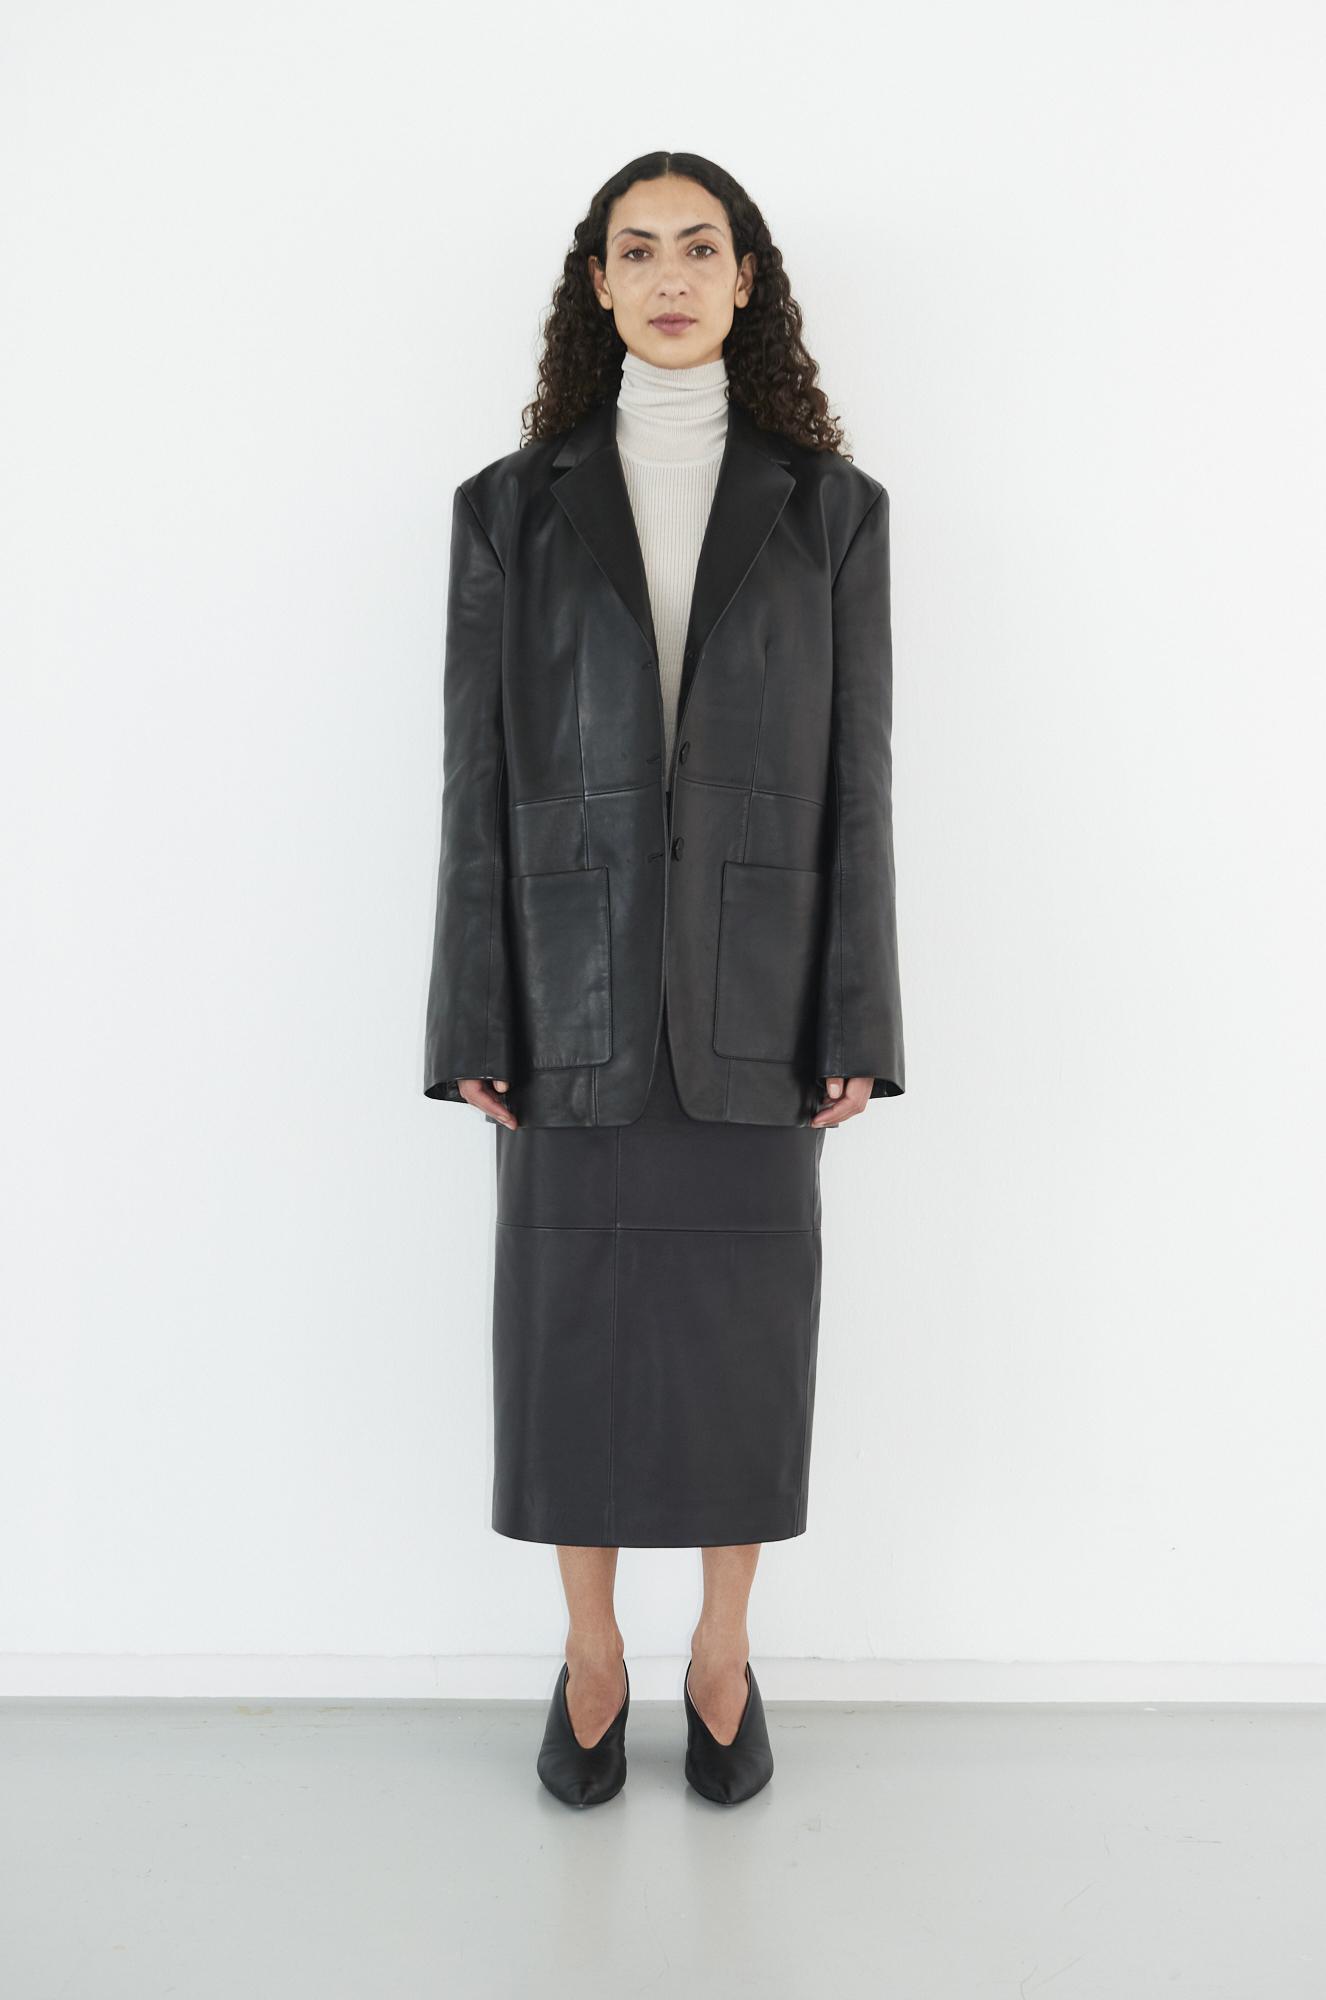 GAUCHERE Fall Winter 2021 Paris Fashion Week LOOK 13 Jacket TYRON, Knit Top TULA, Skirt TWILA, Shoes PILLOW PUMP